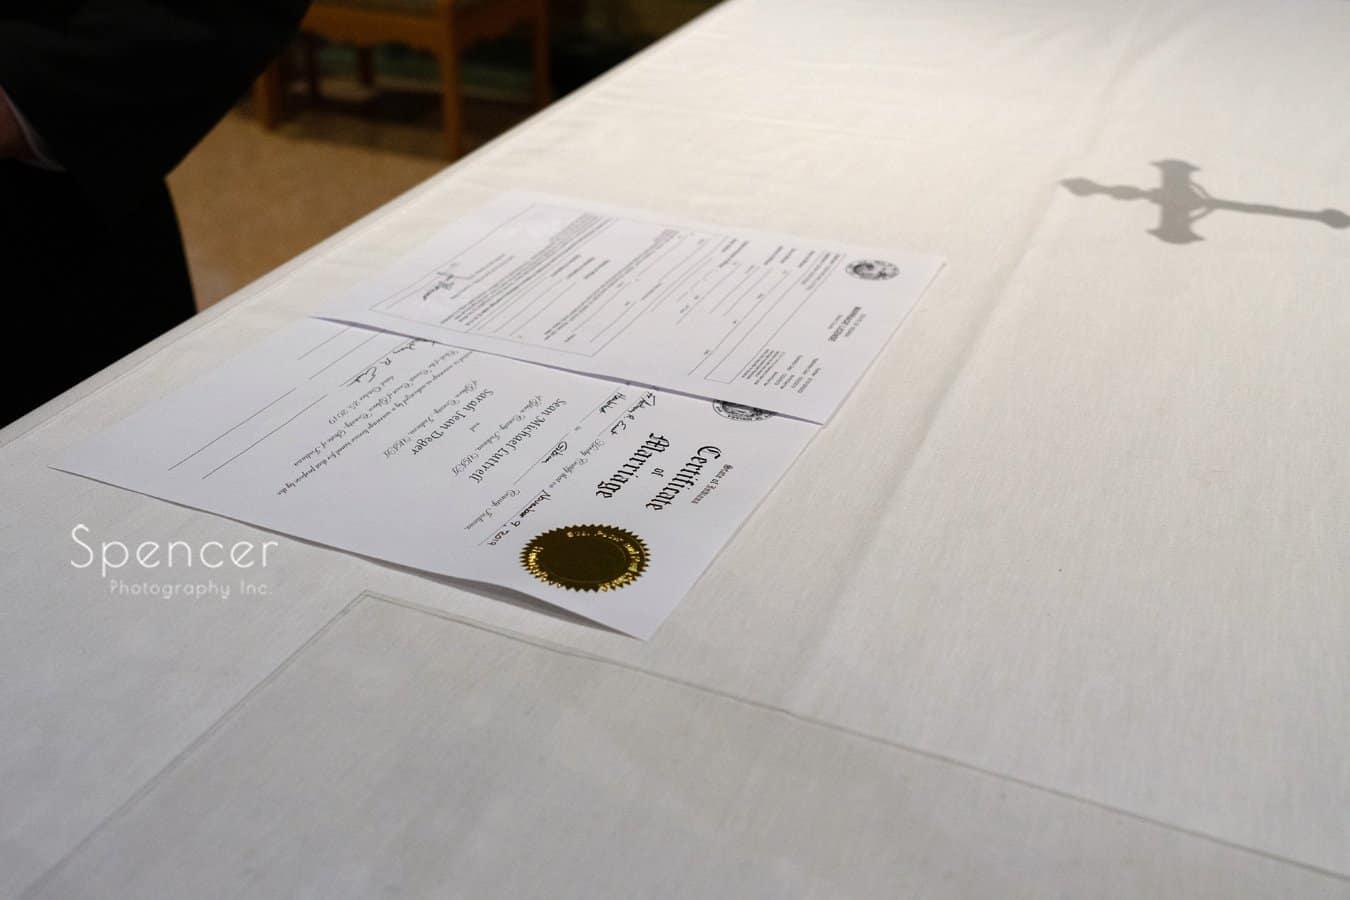 Indiana wedding license